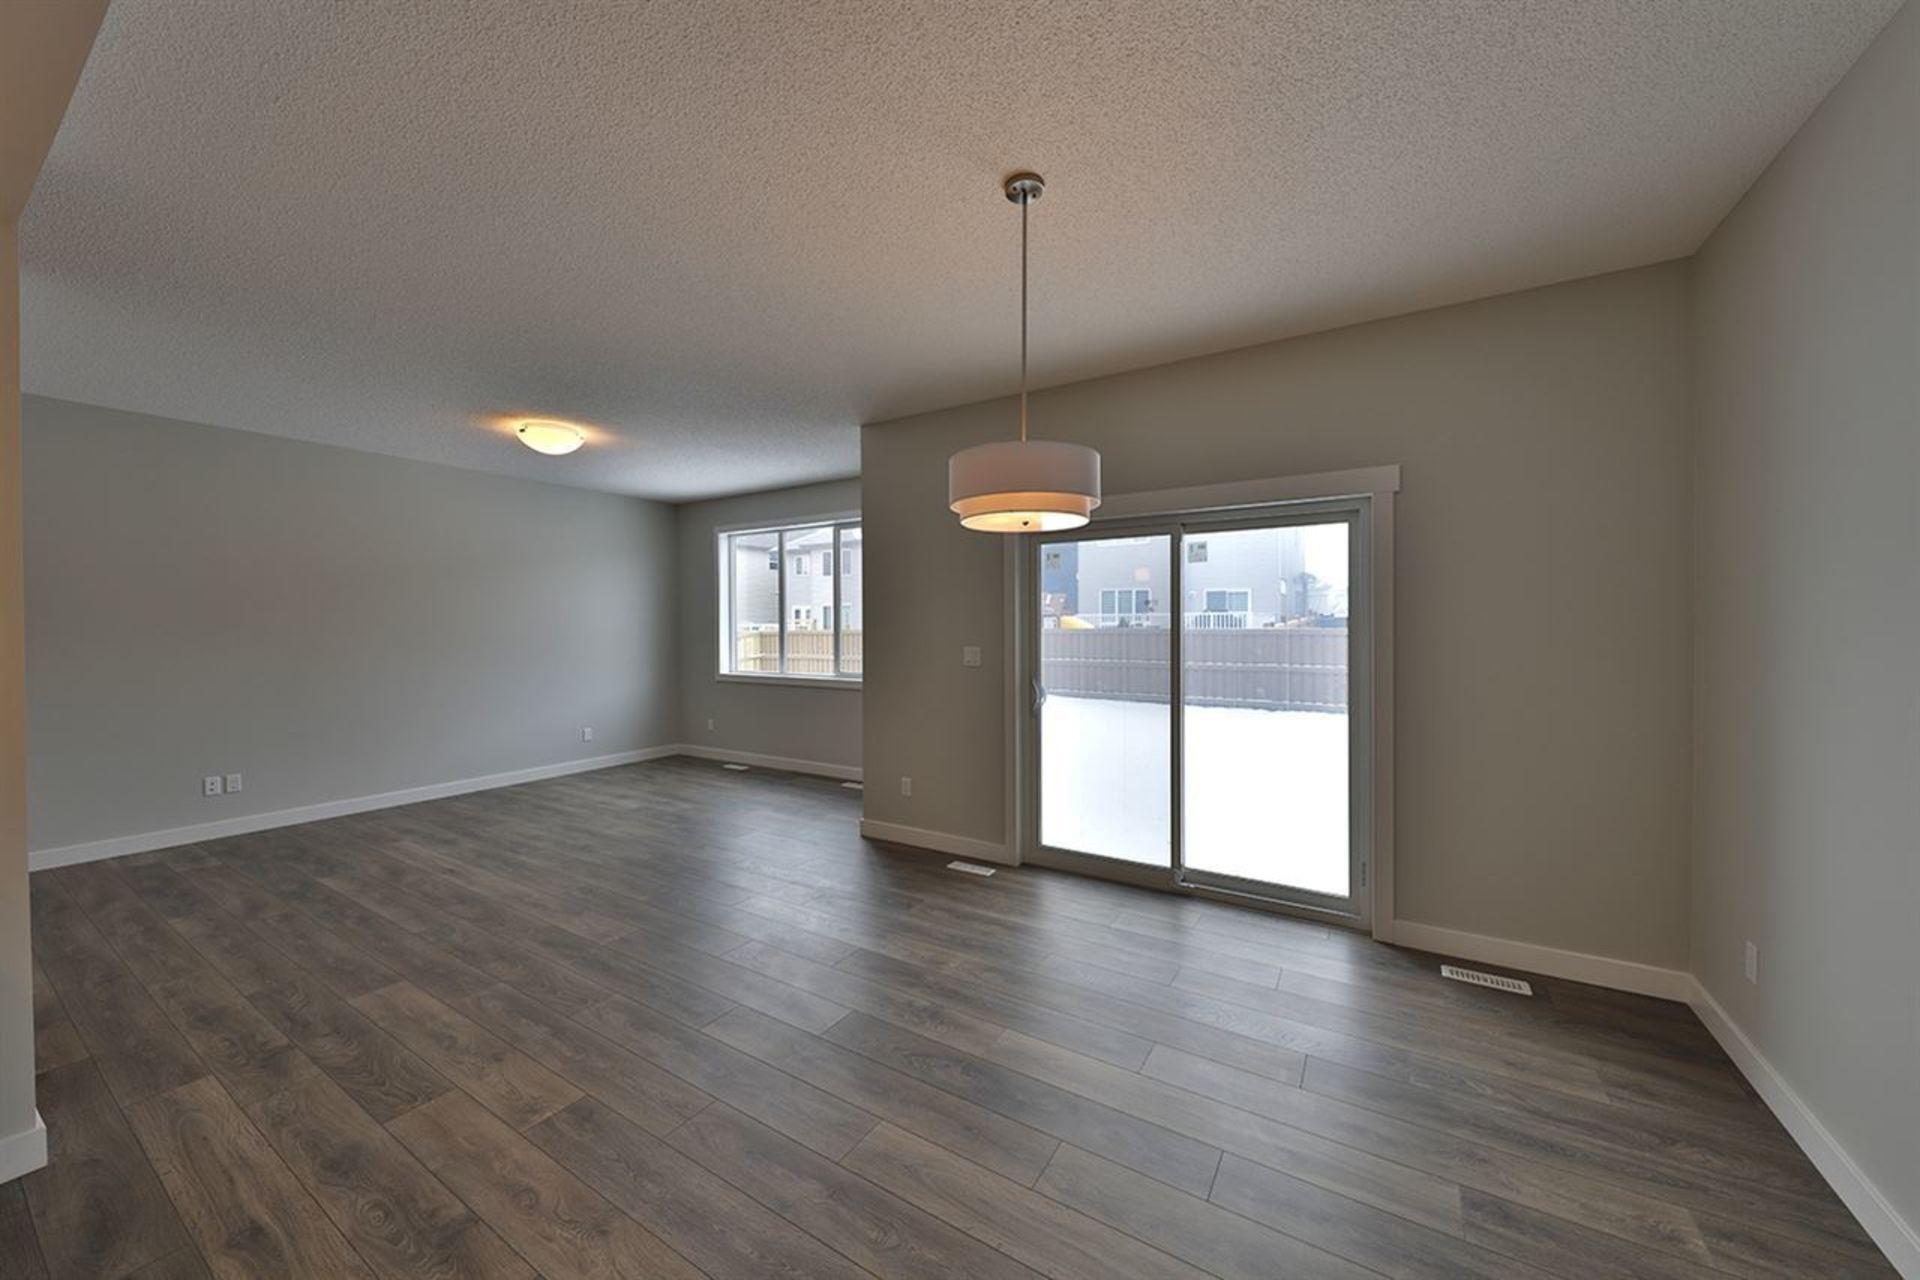 17550-60a-street-mcconachie-area-edmonton-09 at 17550 60a Street, McConachie Area, Edmonton